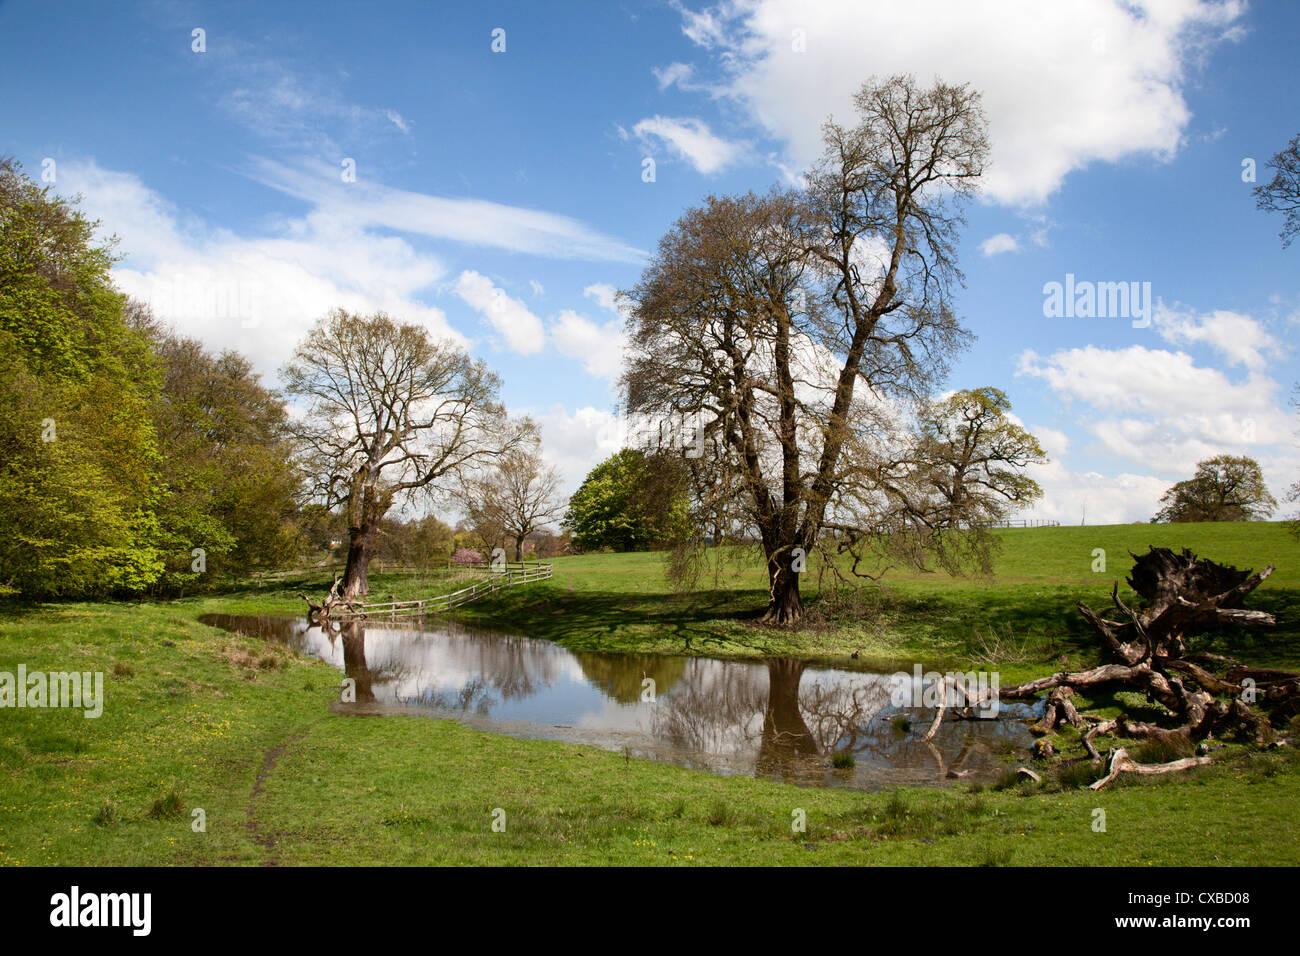 Spring trees and rainwater pond at Jacob Smith Park, Knaresborough, North Yorkshire, England, United Kingdom, Europe - Stock Image